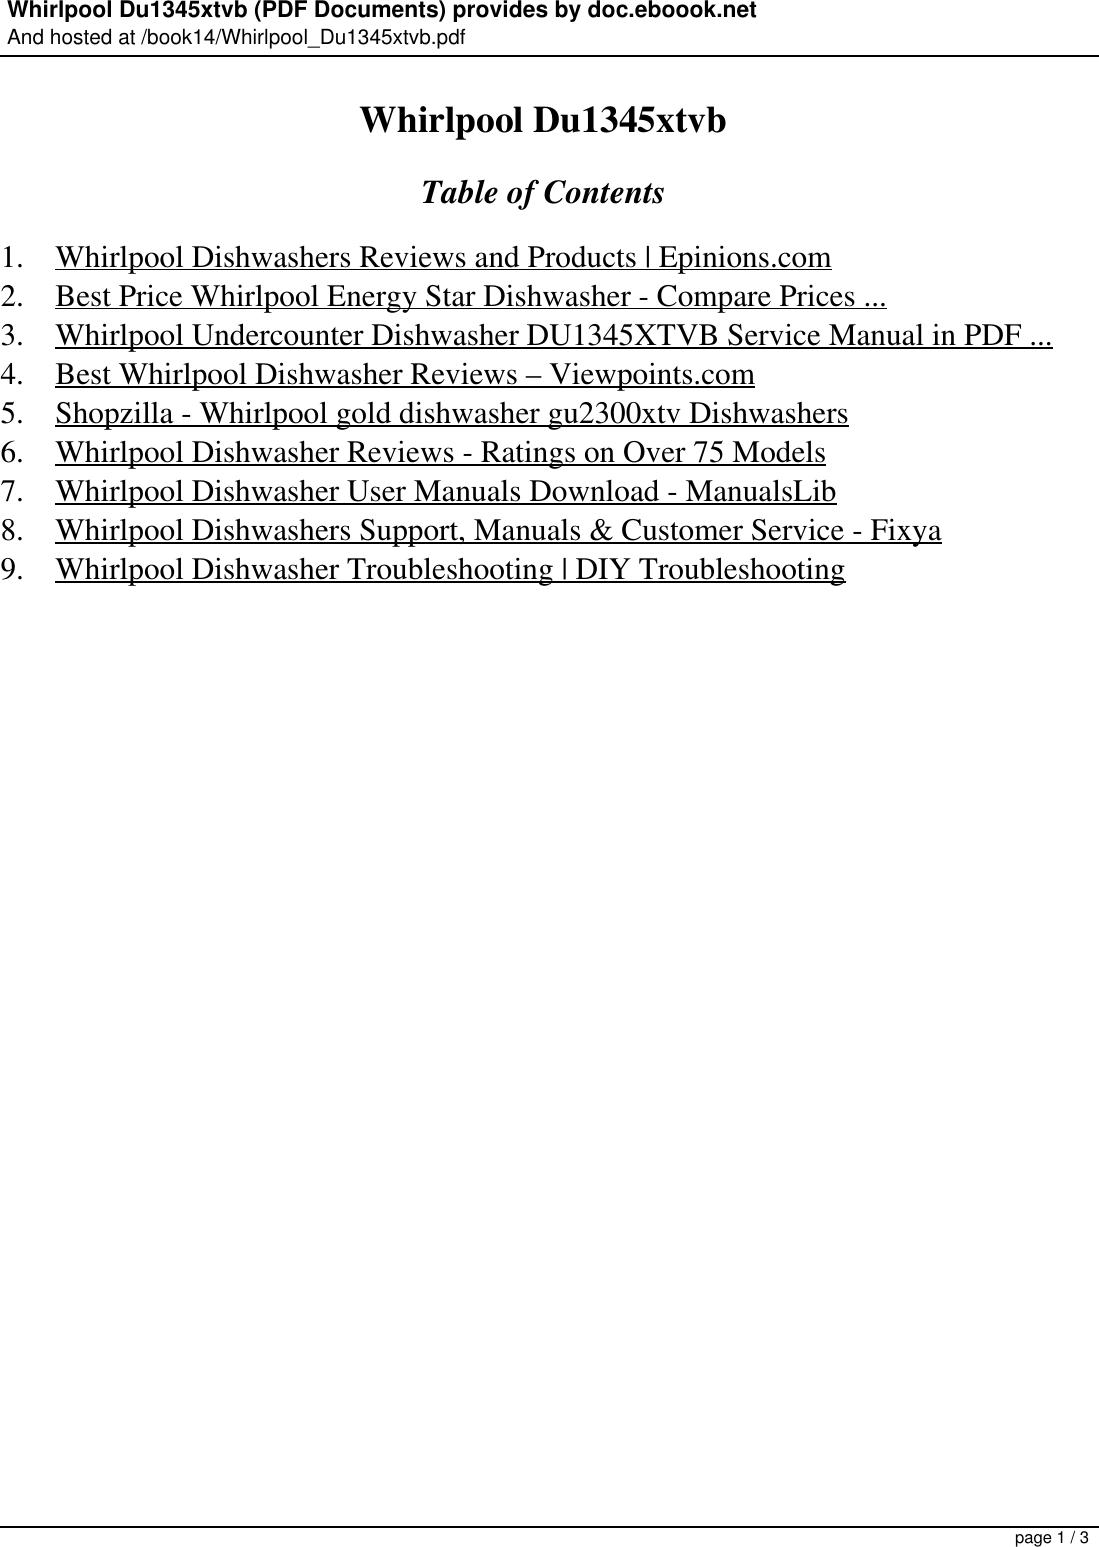 Whirlpool Dishwasher Du1345Xtvb Users Manual